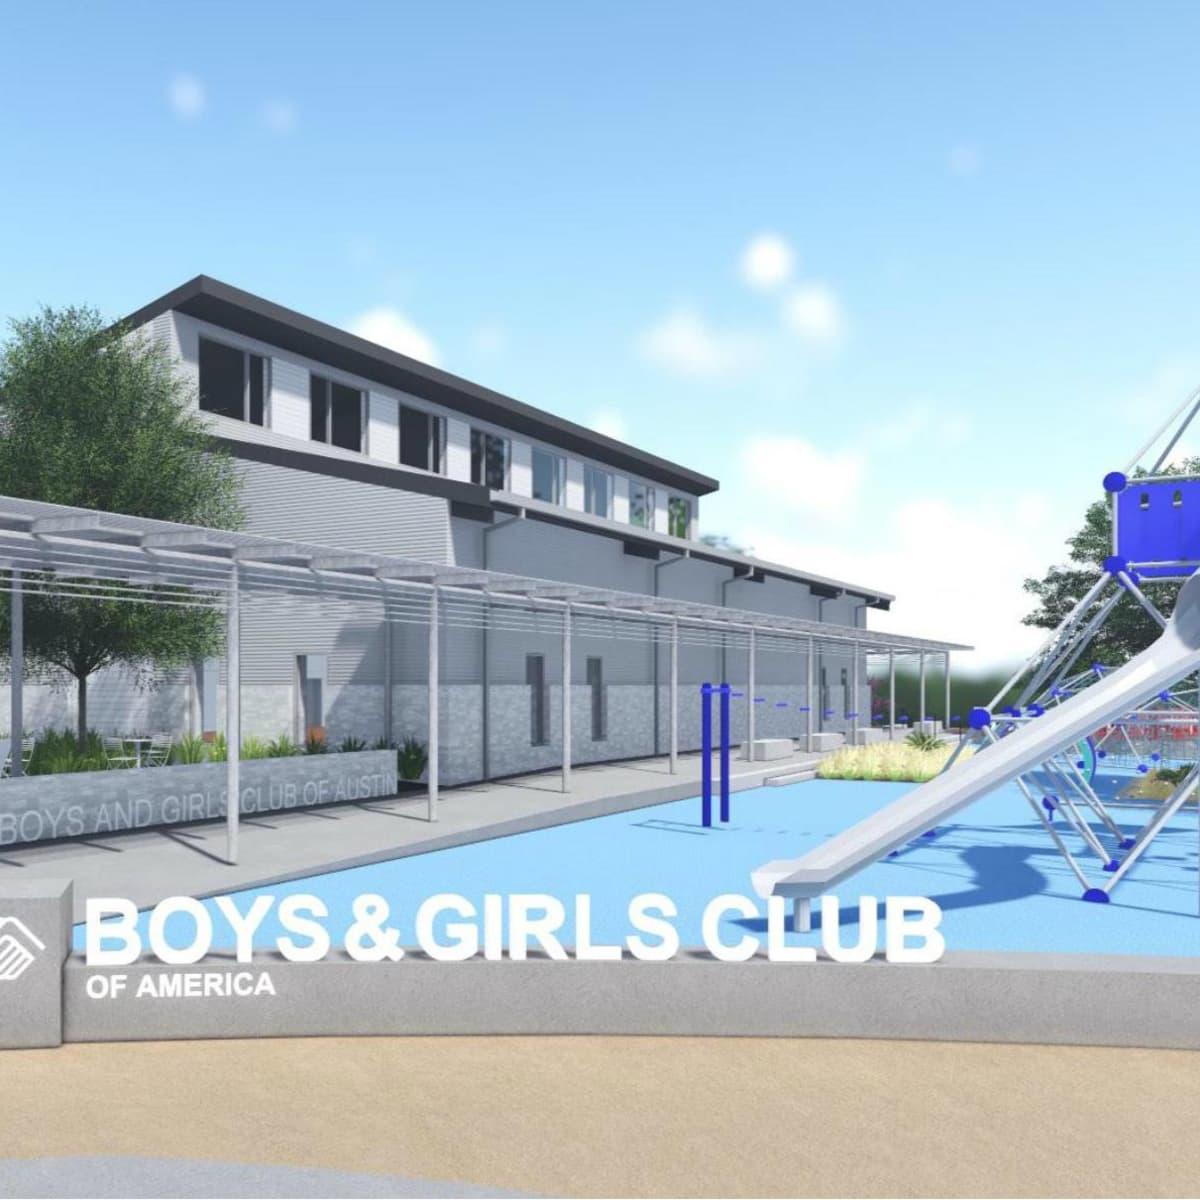 Boy & Girls Club Landscape Concept 2